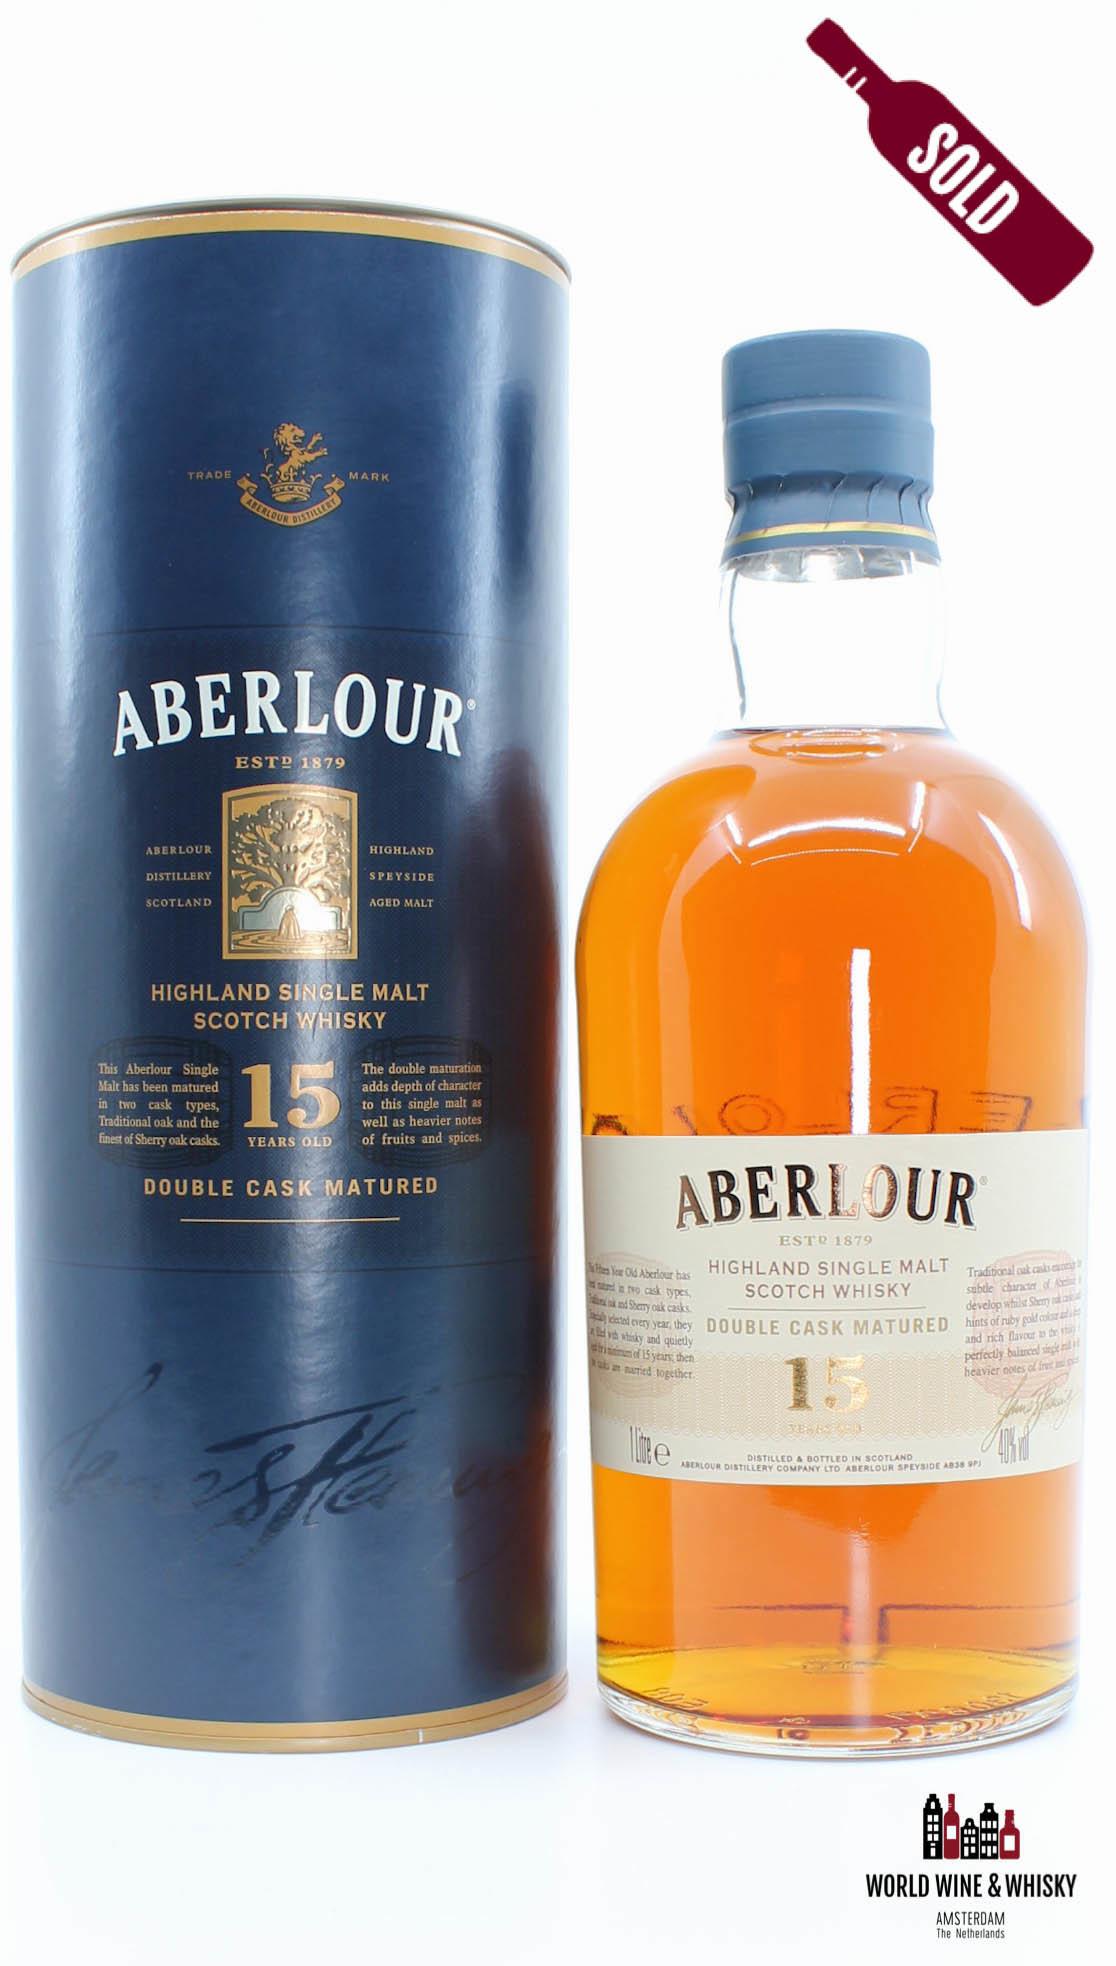 Aberlour Aberlour 15 Years Old 2015 Double Cask Matured 40% (1 Litre)